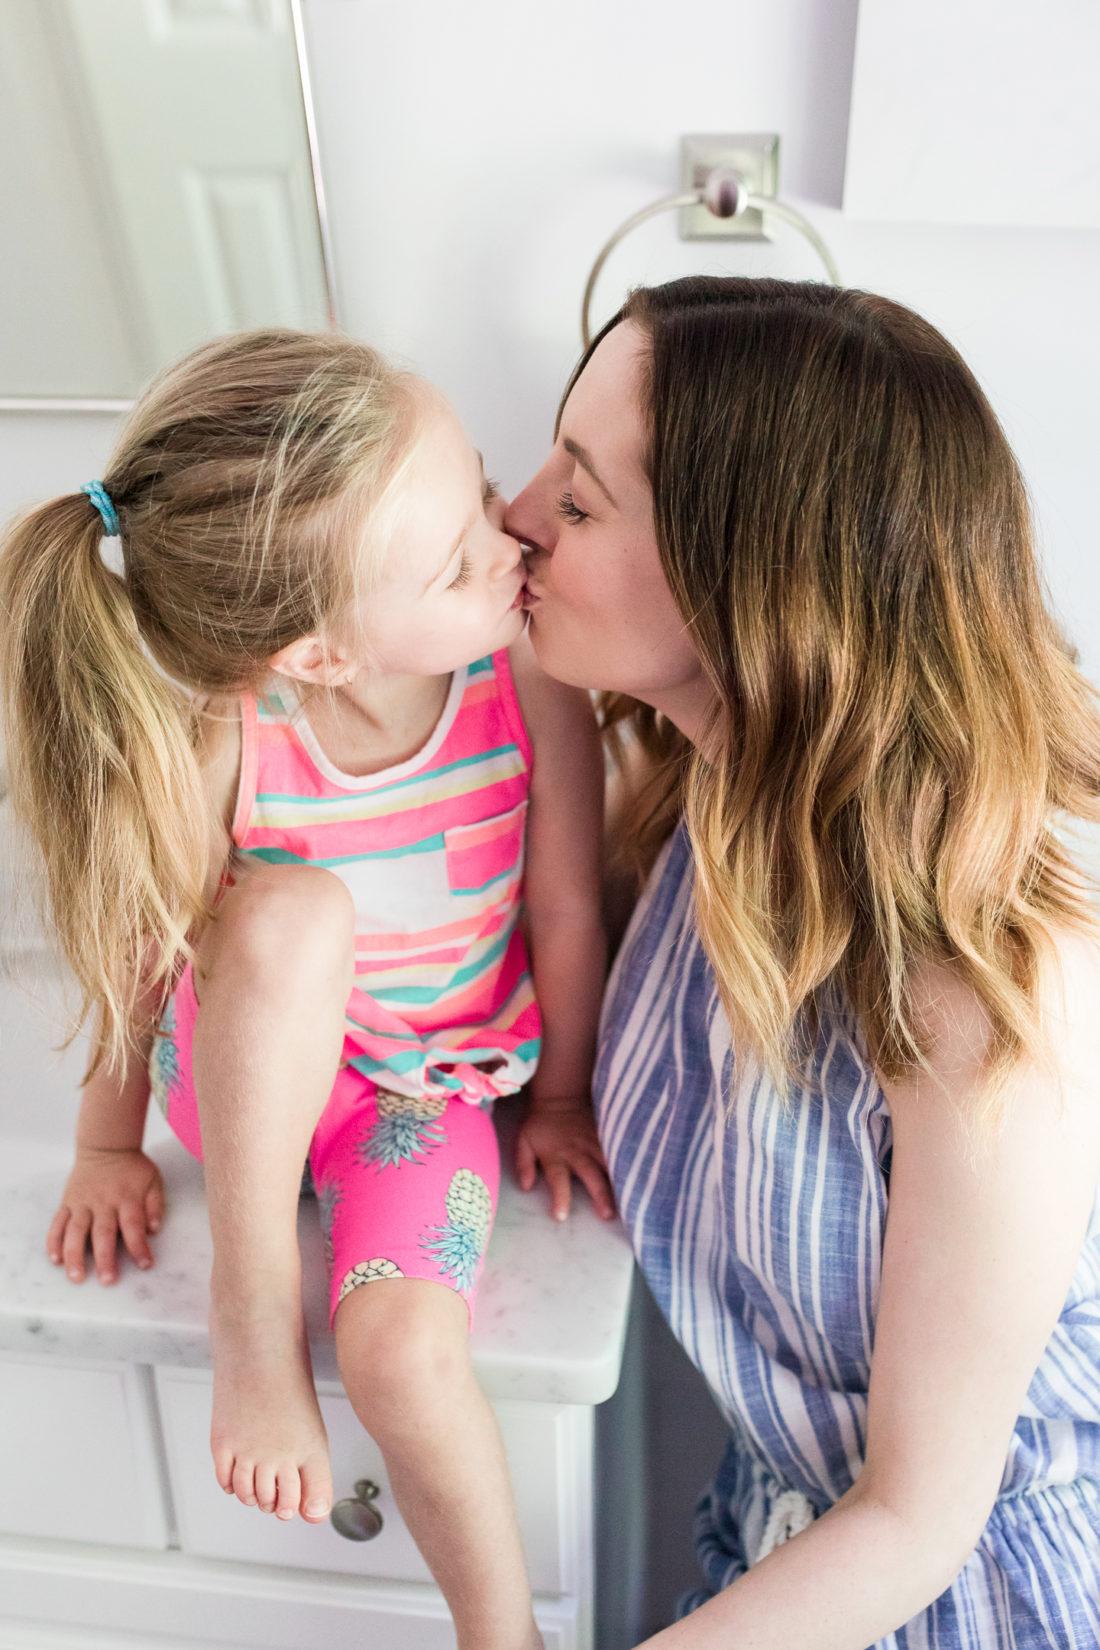 Eva Amurri Martino kisses her two year old daughter, Marlowe